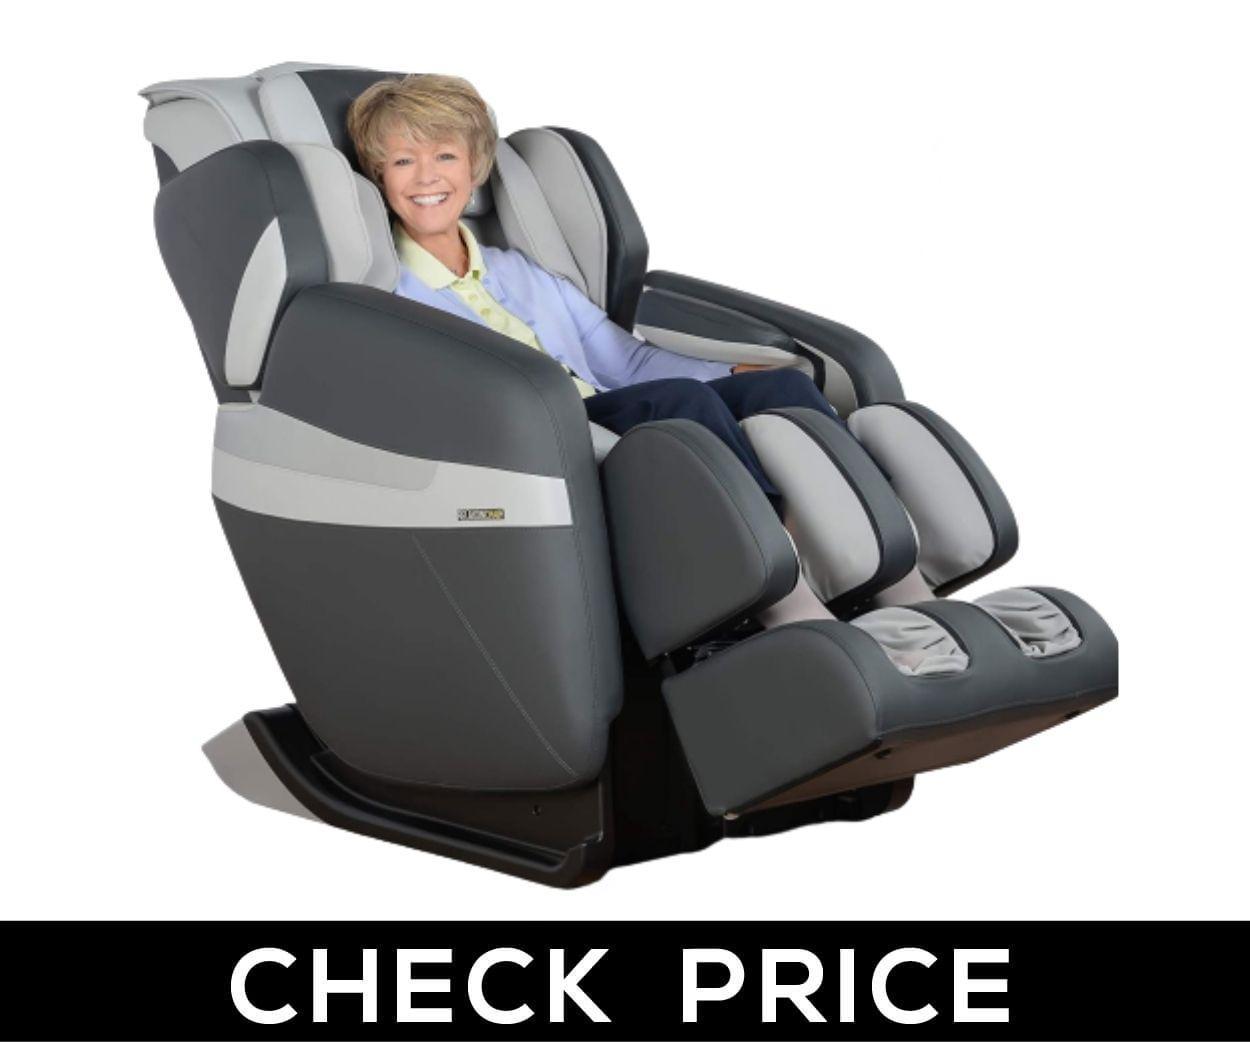 RelaxOnChair – Full Body Zero Gravity Massage Chair